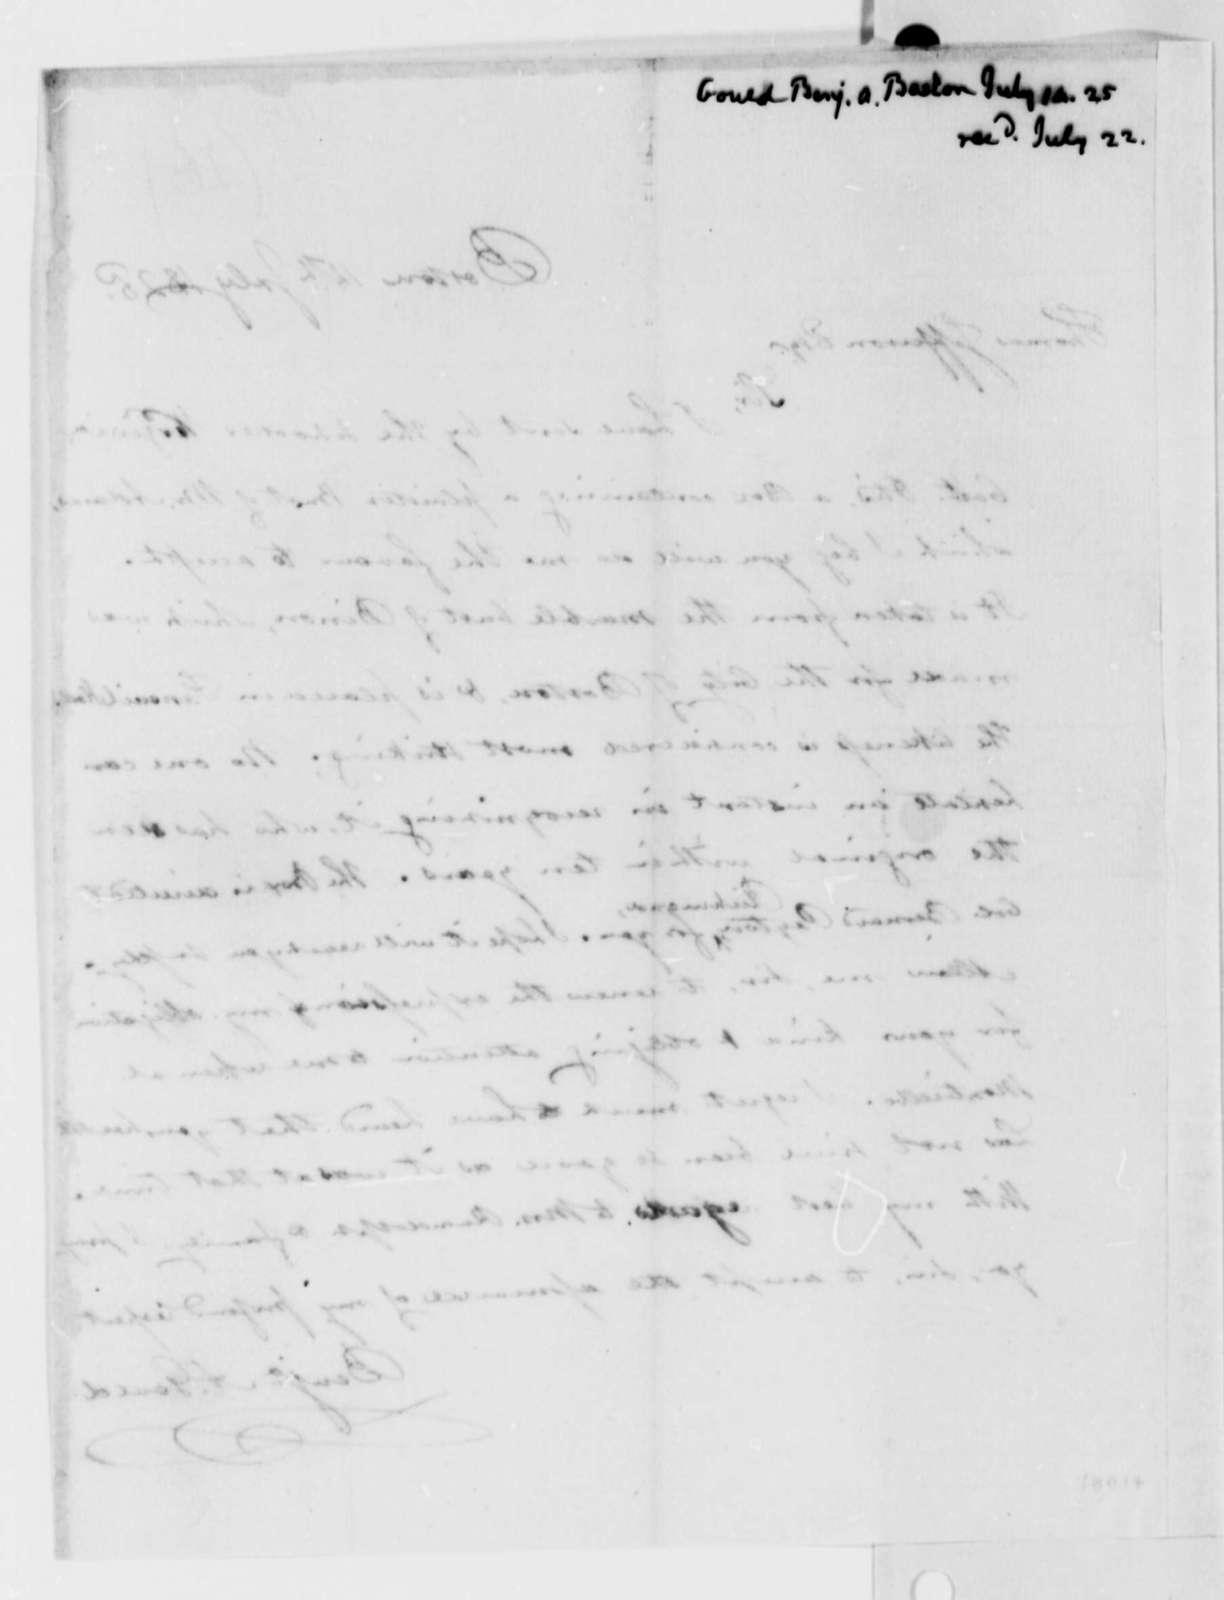 Benjamin A. Gould to Thomas Jefferson, July 14, 1825